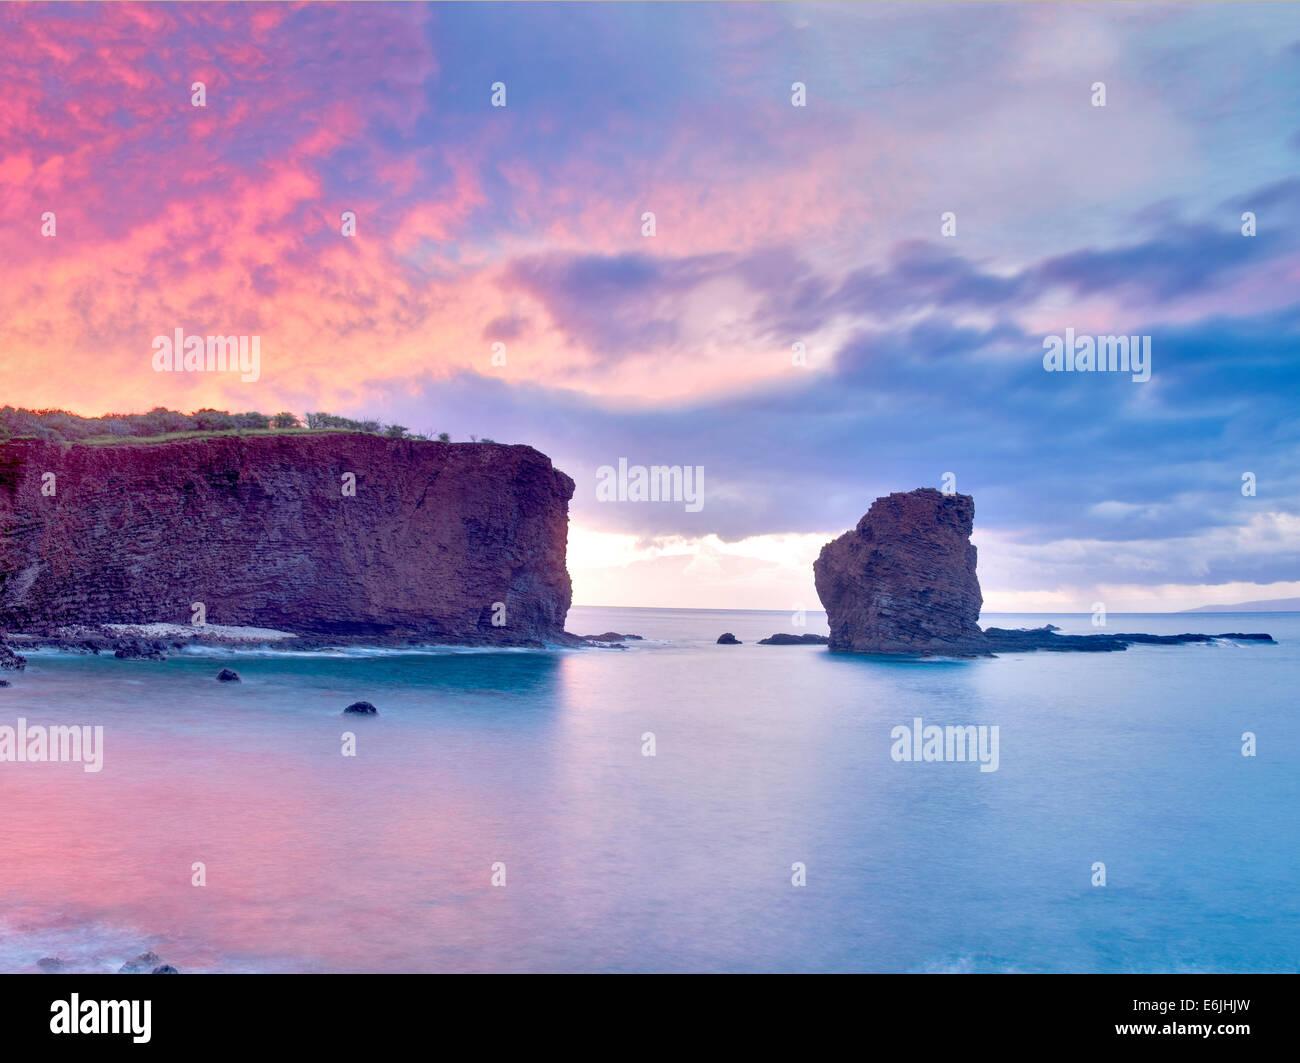 Sweetheart Rock at sunset. Lanai, Hawaii Stock Photo